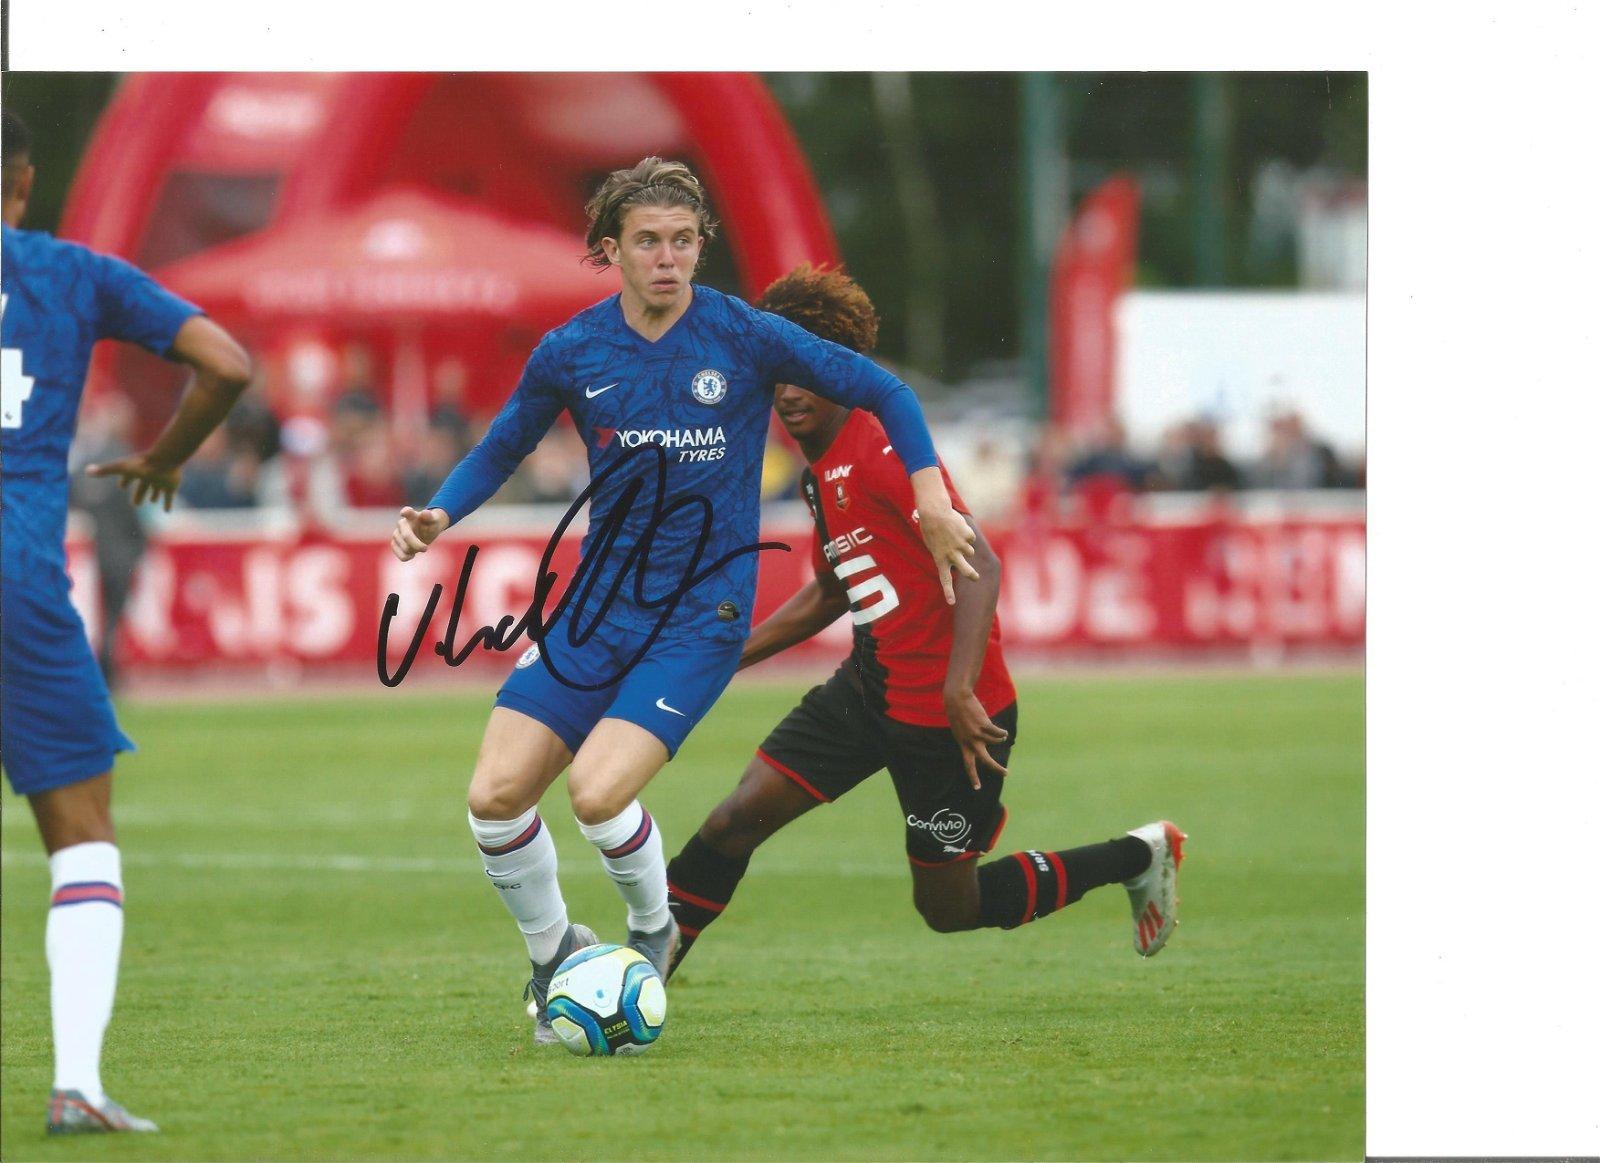 Chelsea 4 Signed 8x10 & 8x12 Photos David Luiz, Gary